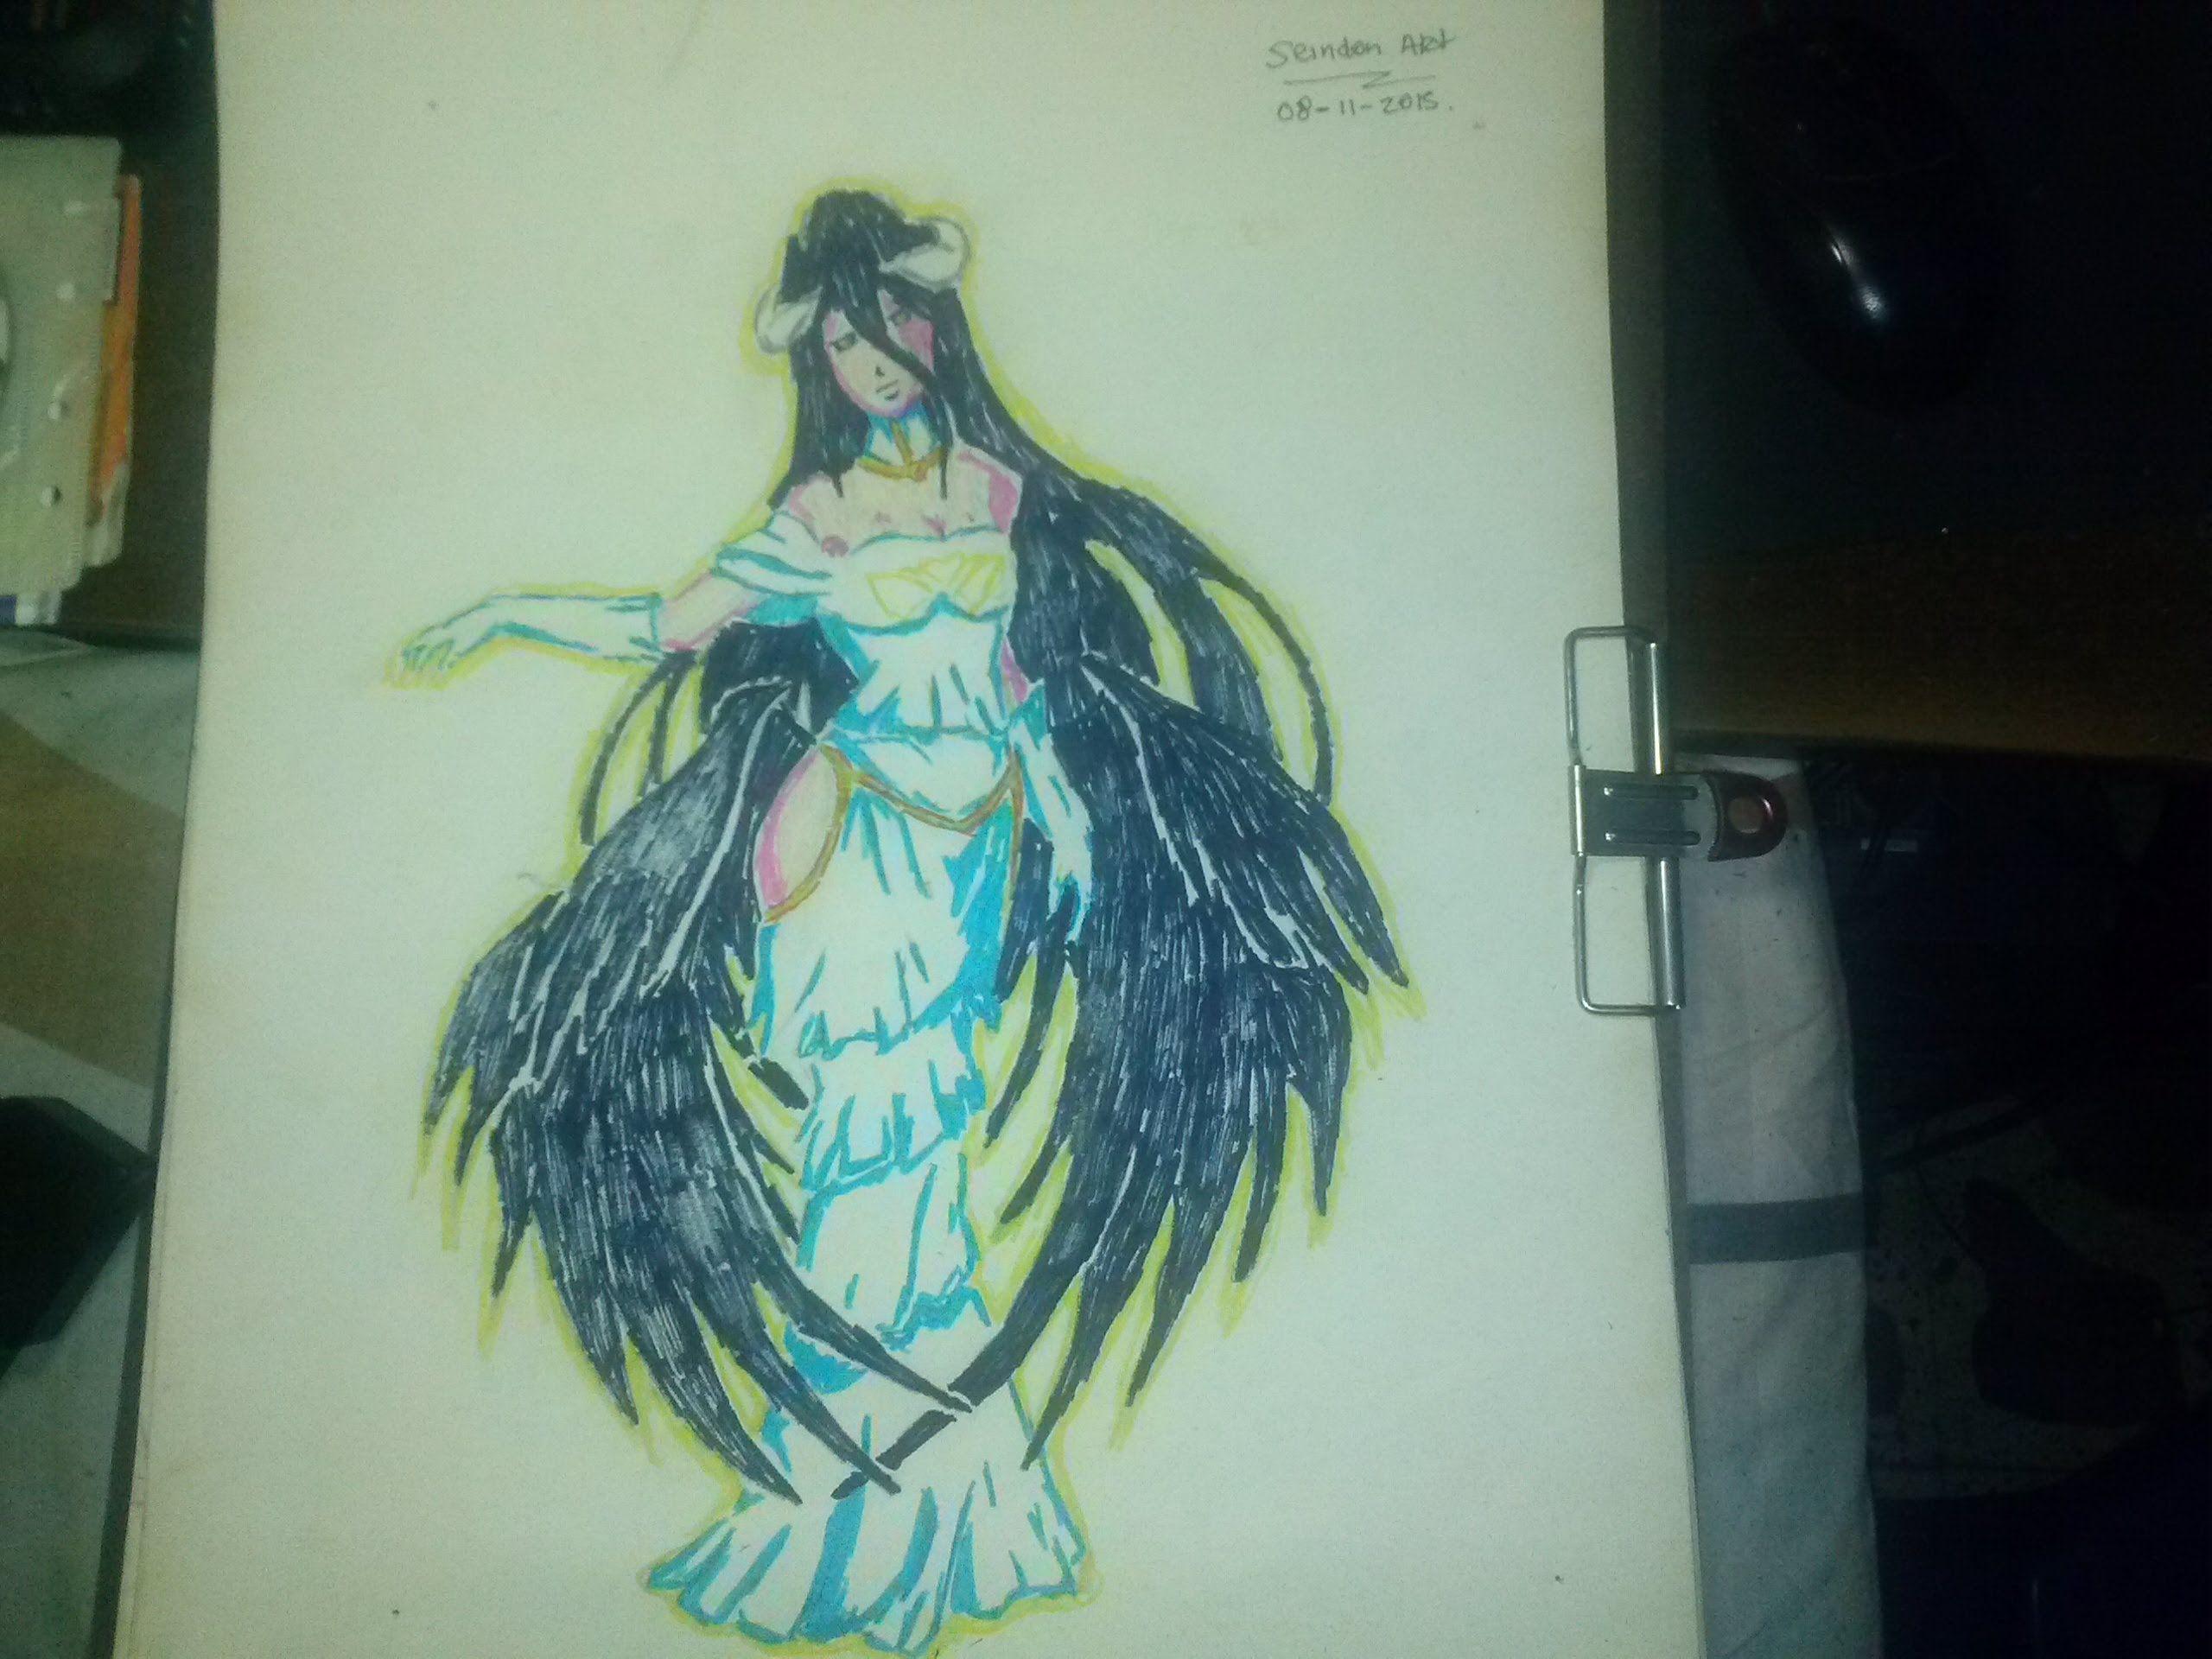 Dibujando A Albedo Del Anime Overlord /A Drawing Albedo Of Overlord Anime